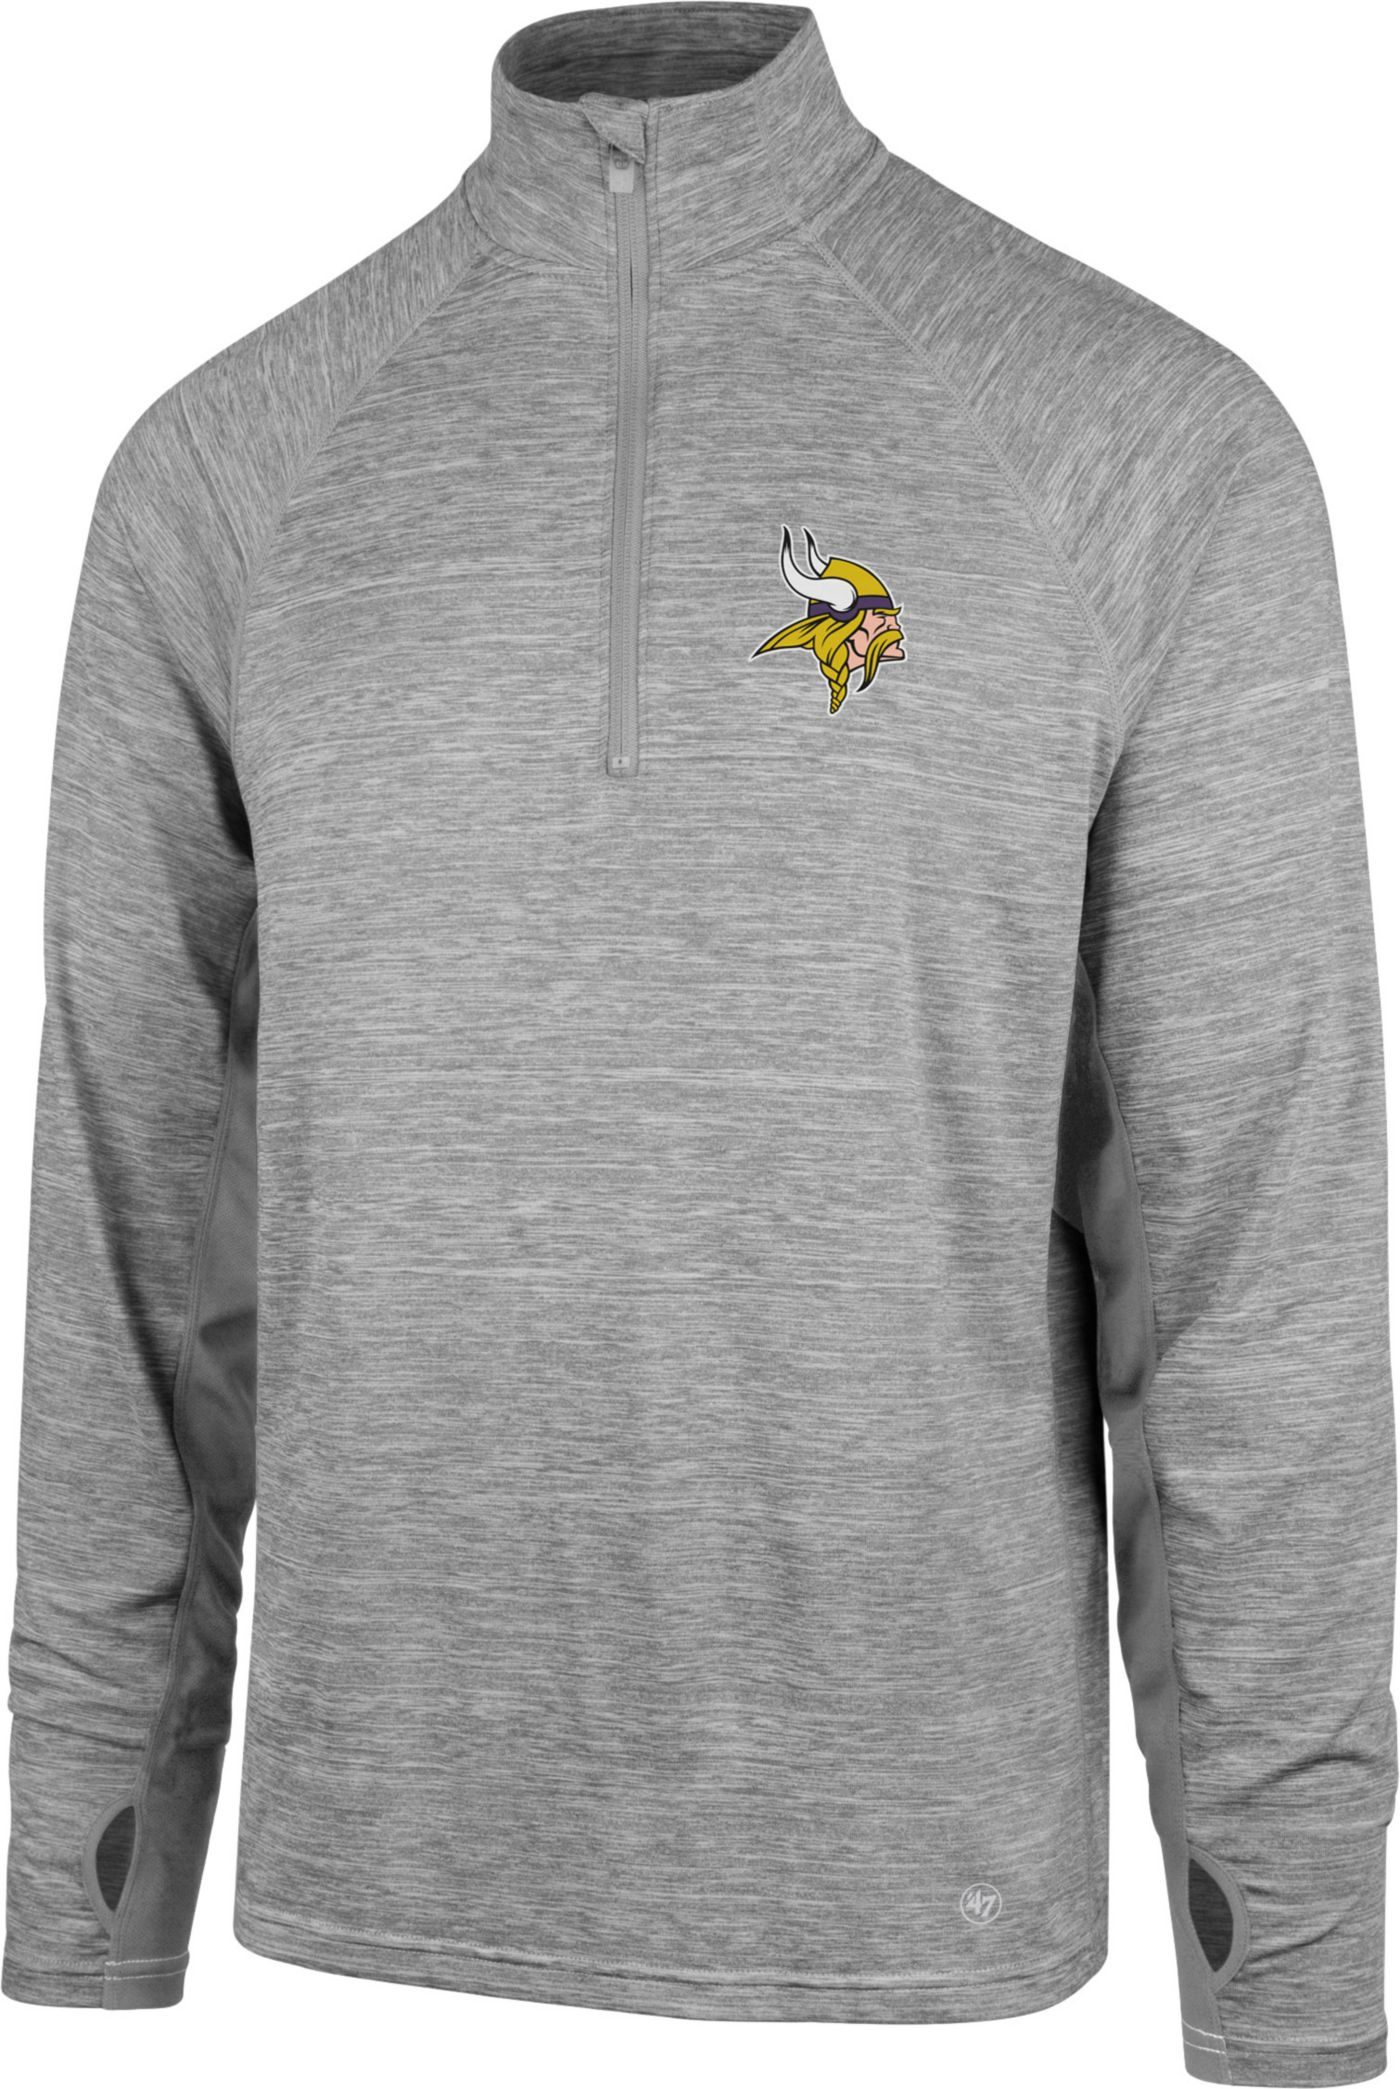 '47 Men's Minnesota Vikings Forward Grey Quarter-Zip Pullover